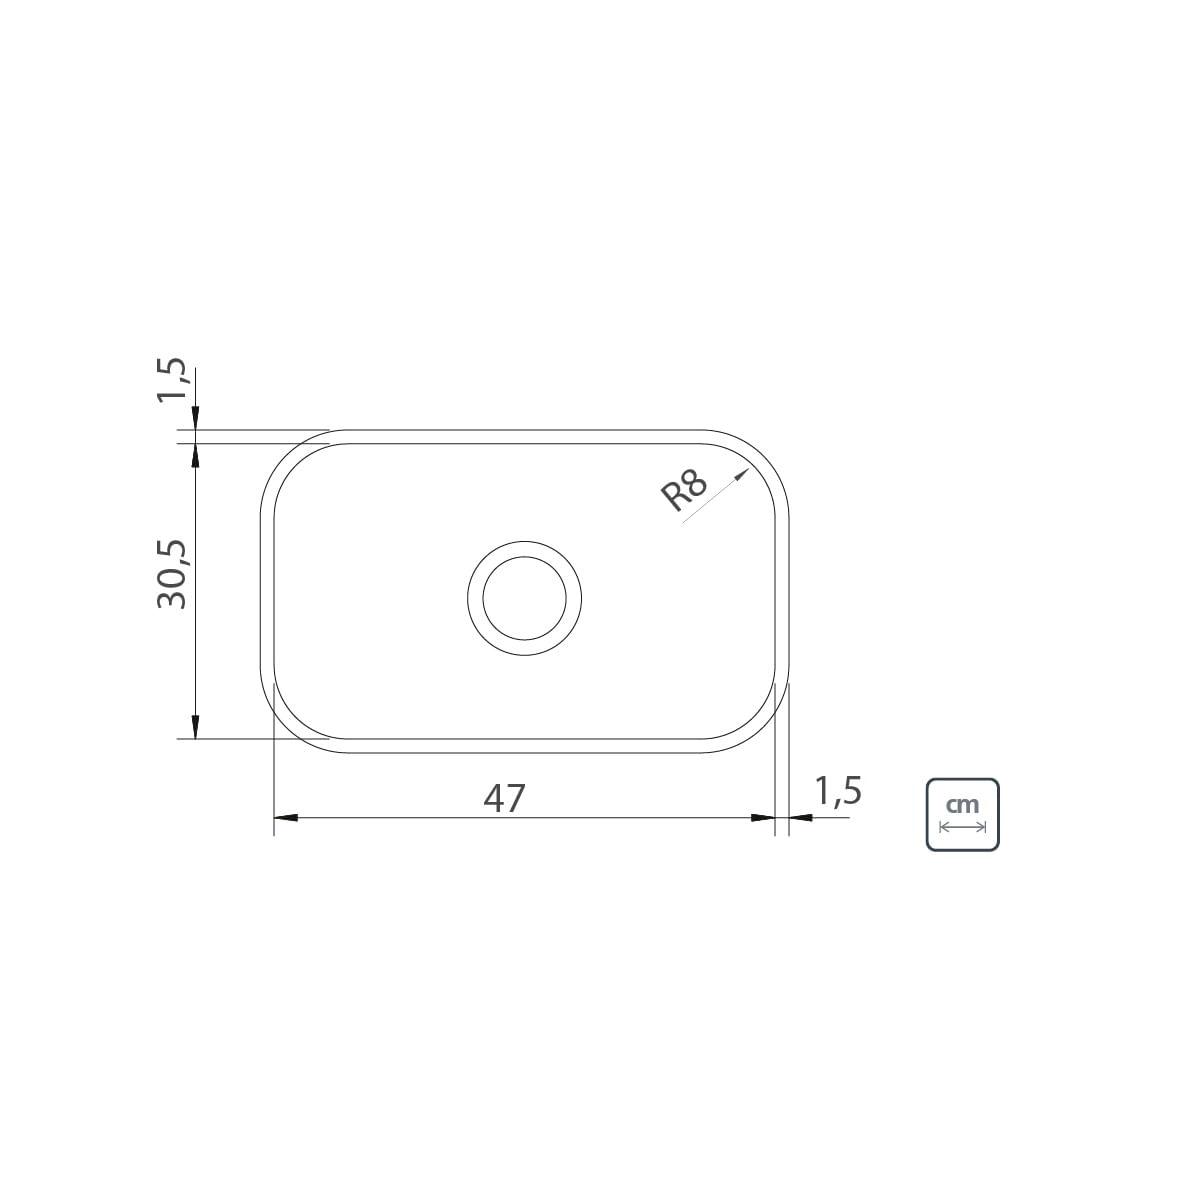 Cuba n.1 Tramontina 47 x 30 x 14 cm Lavínia 47 BL Standard em Aço Inox 430 Polido Sem Válvula